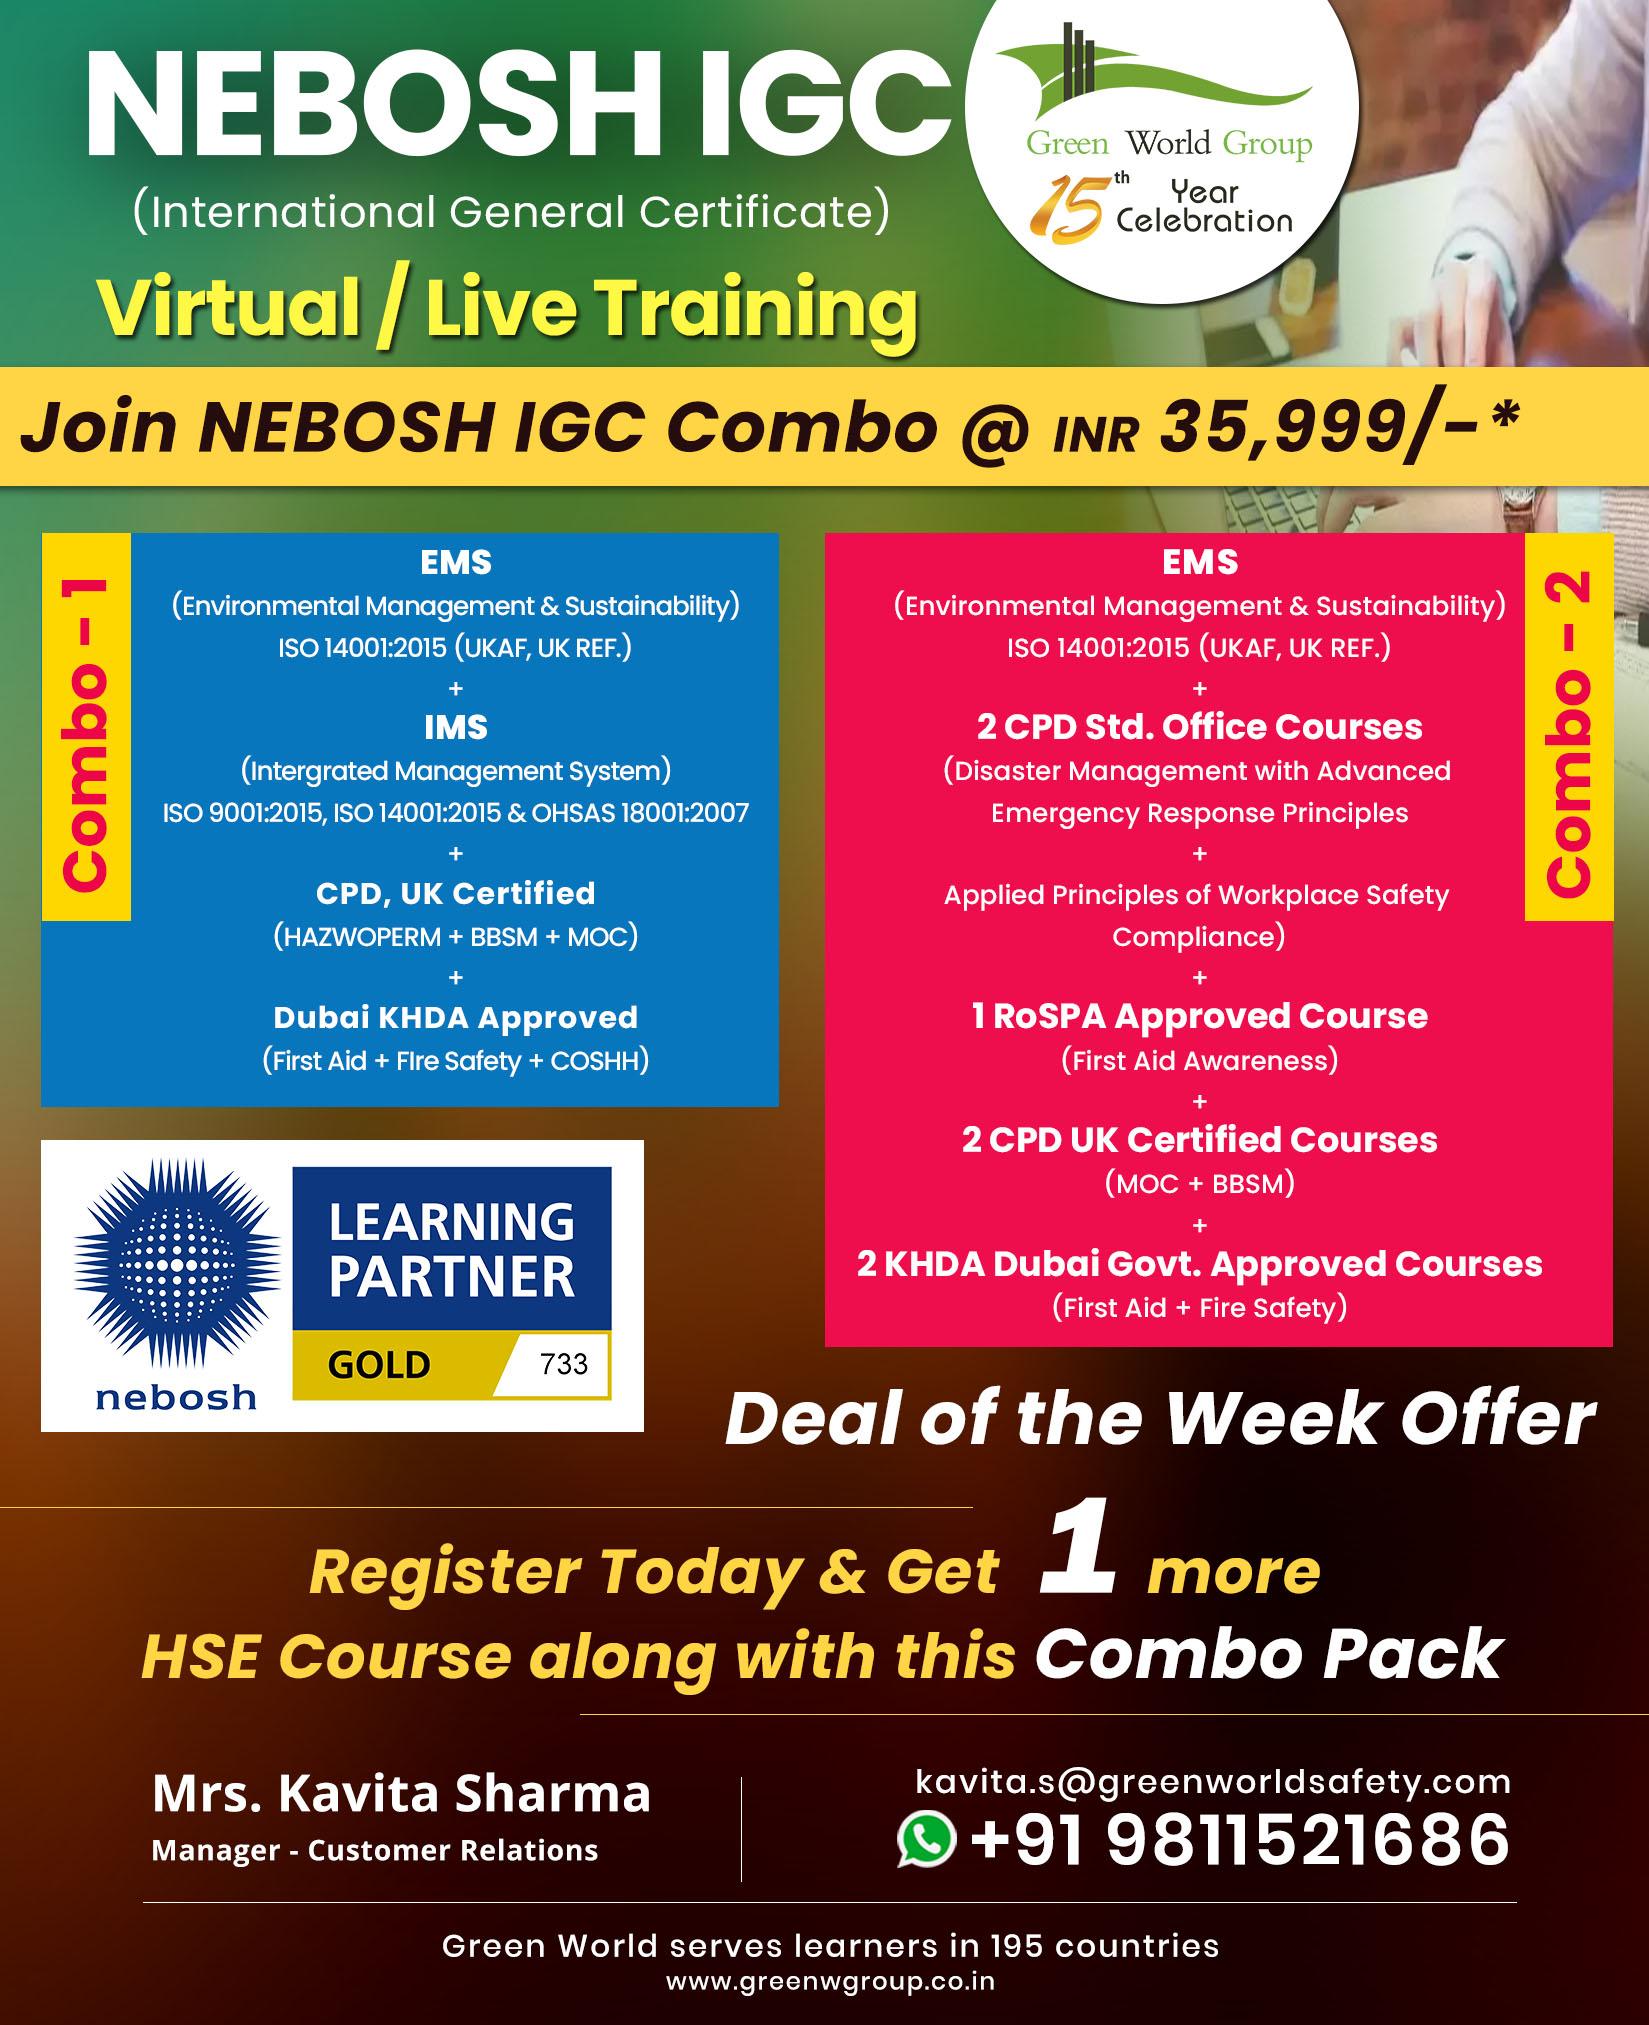 Nebosh_IGC_Offer_India